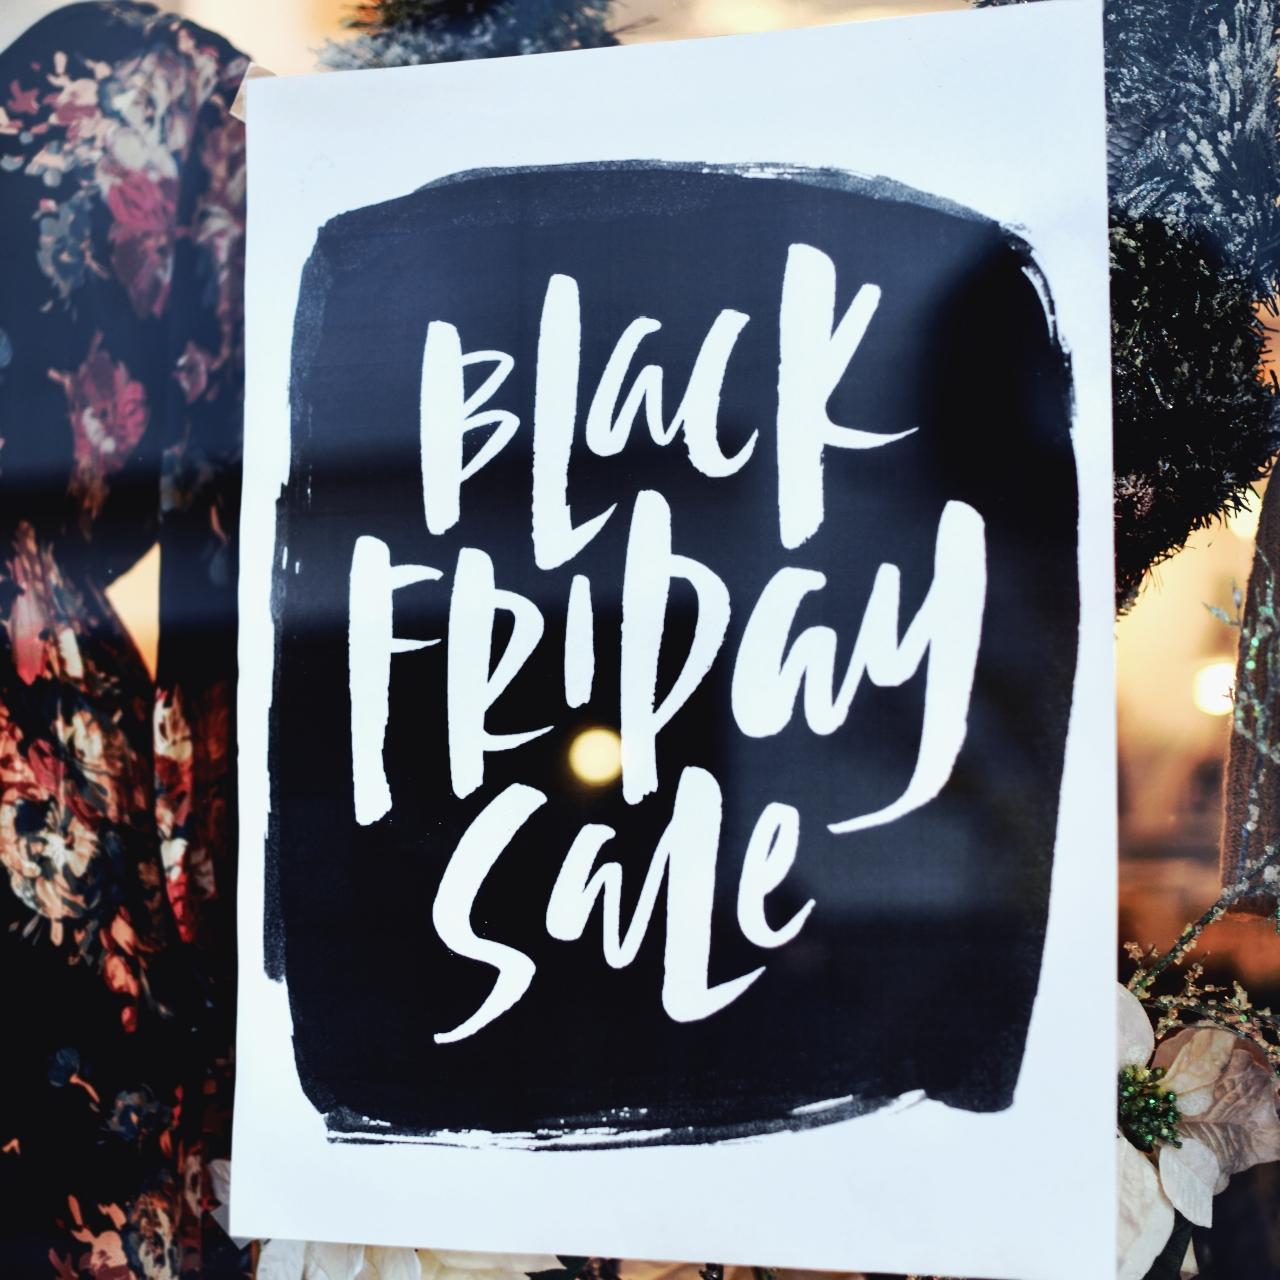 Black friday sale winkel etalage blog